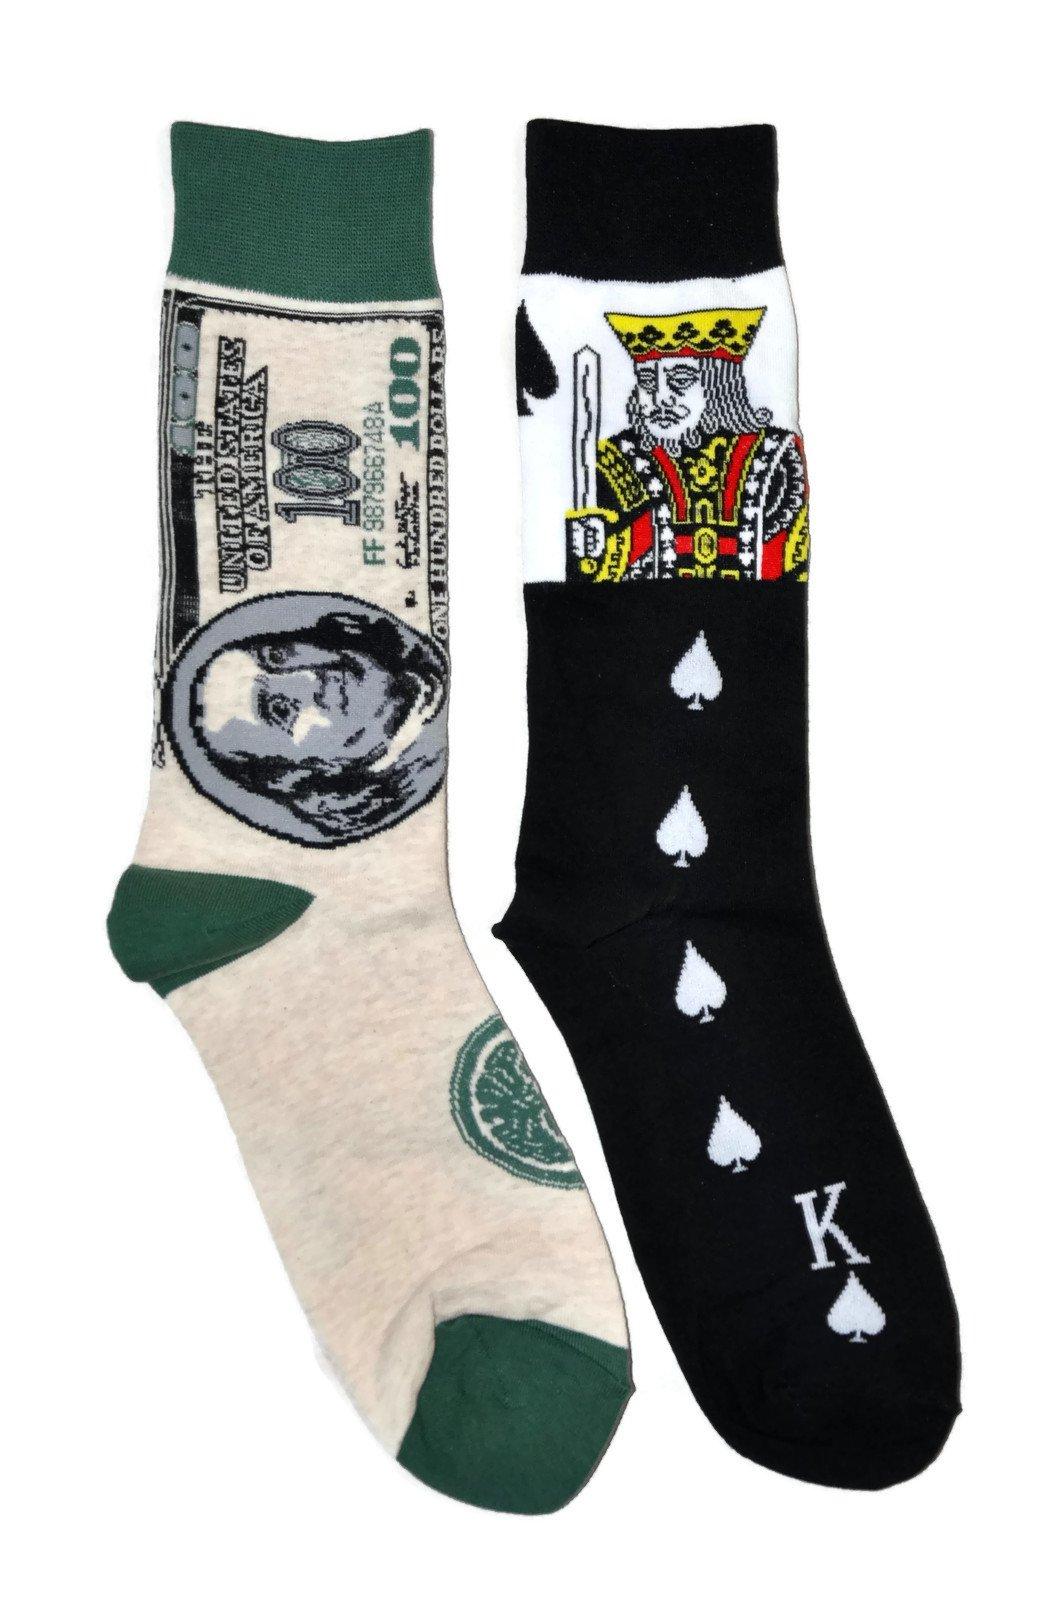 Mens Novelty Trouser Socks 2 Pair Bundle FineFit Themed Pattern (Cards & Money)